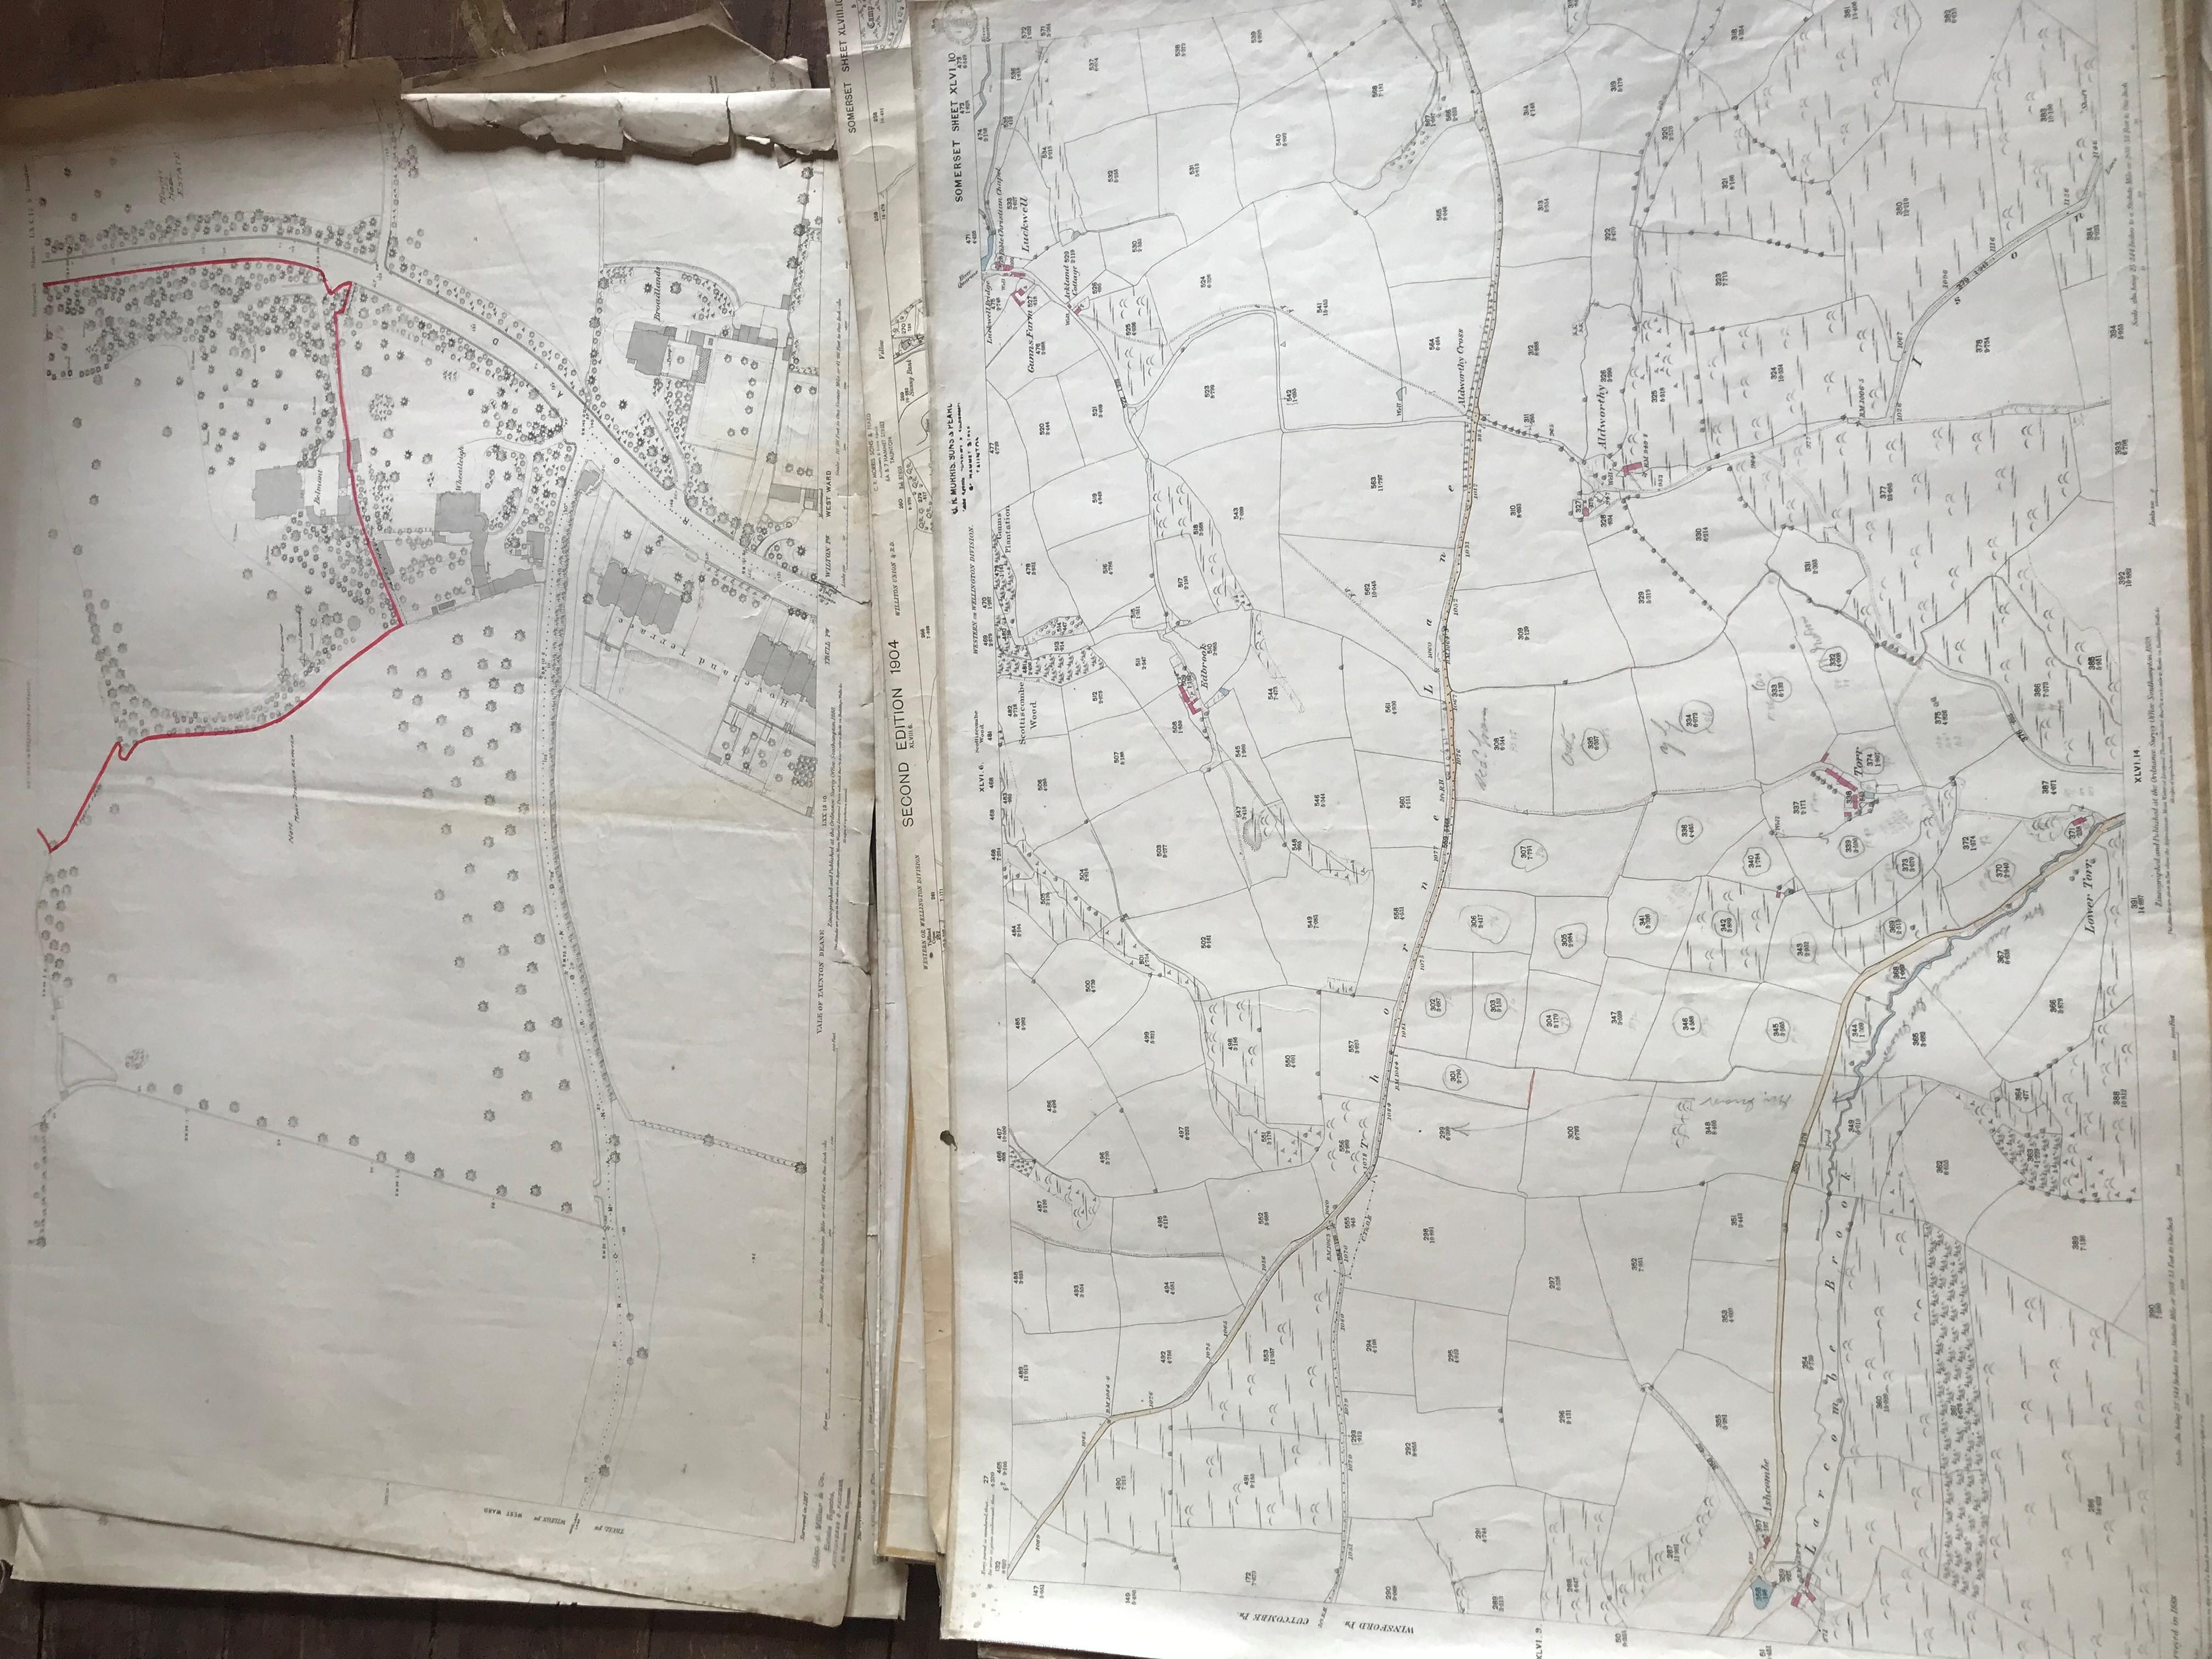 THIRTY 1:2500 ORDNANCE SURVEY MAPS featuring Chelston, Ham, Sampford Brett, Wellington, - Image 8 of 16